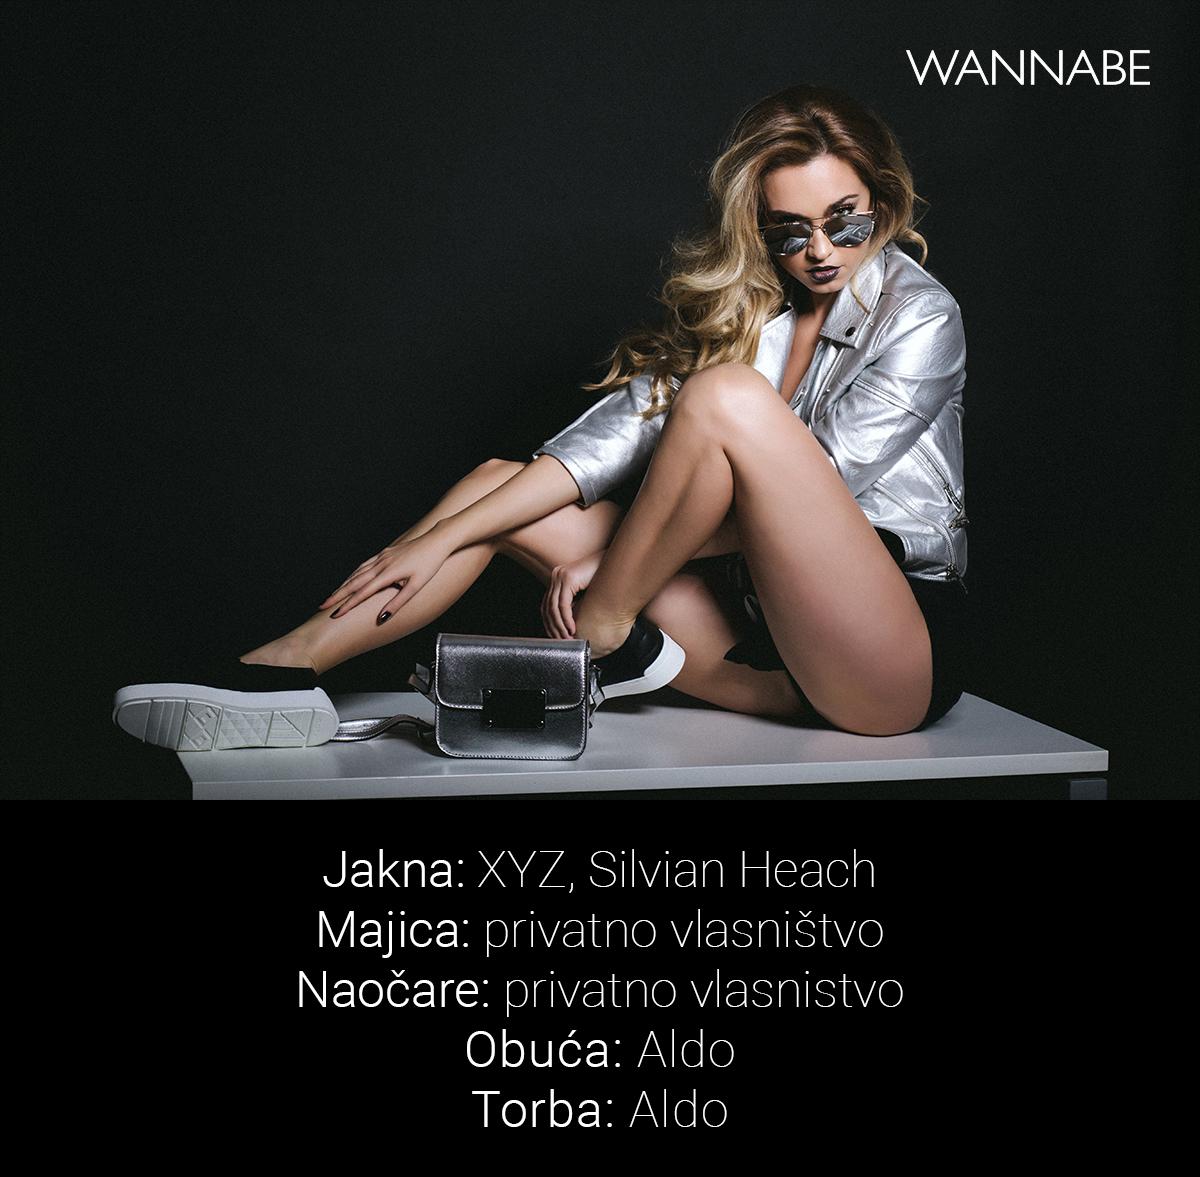 Wannabe Editorijal Mart W1200 9 Wannabe editorijal: BlacknWhite